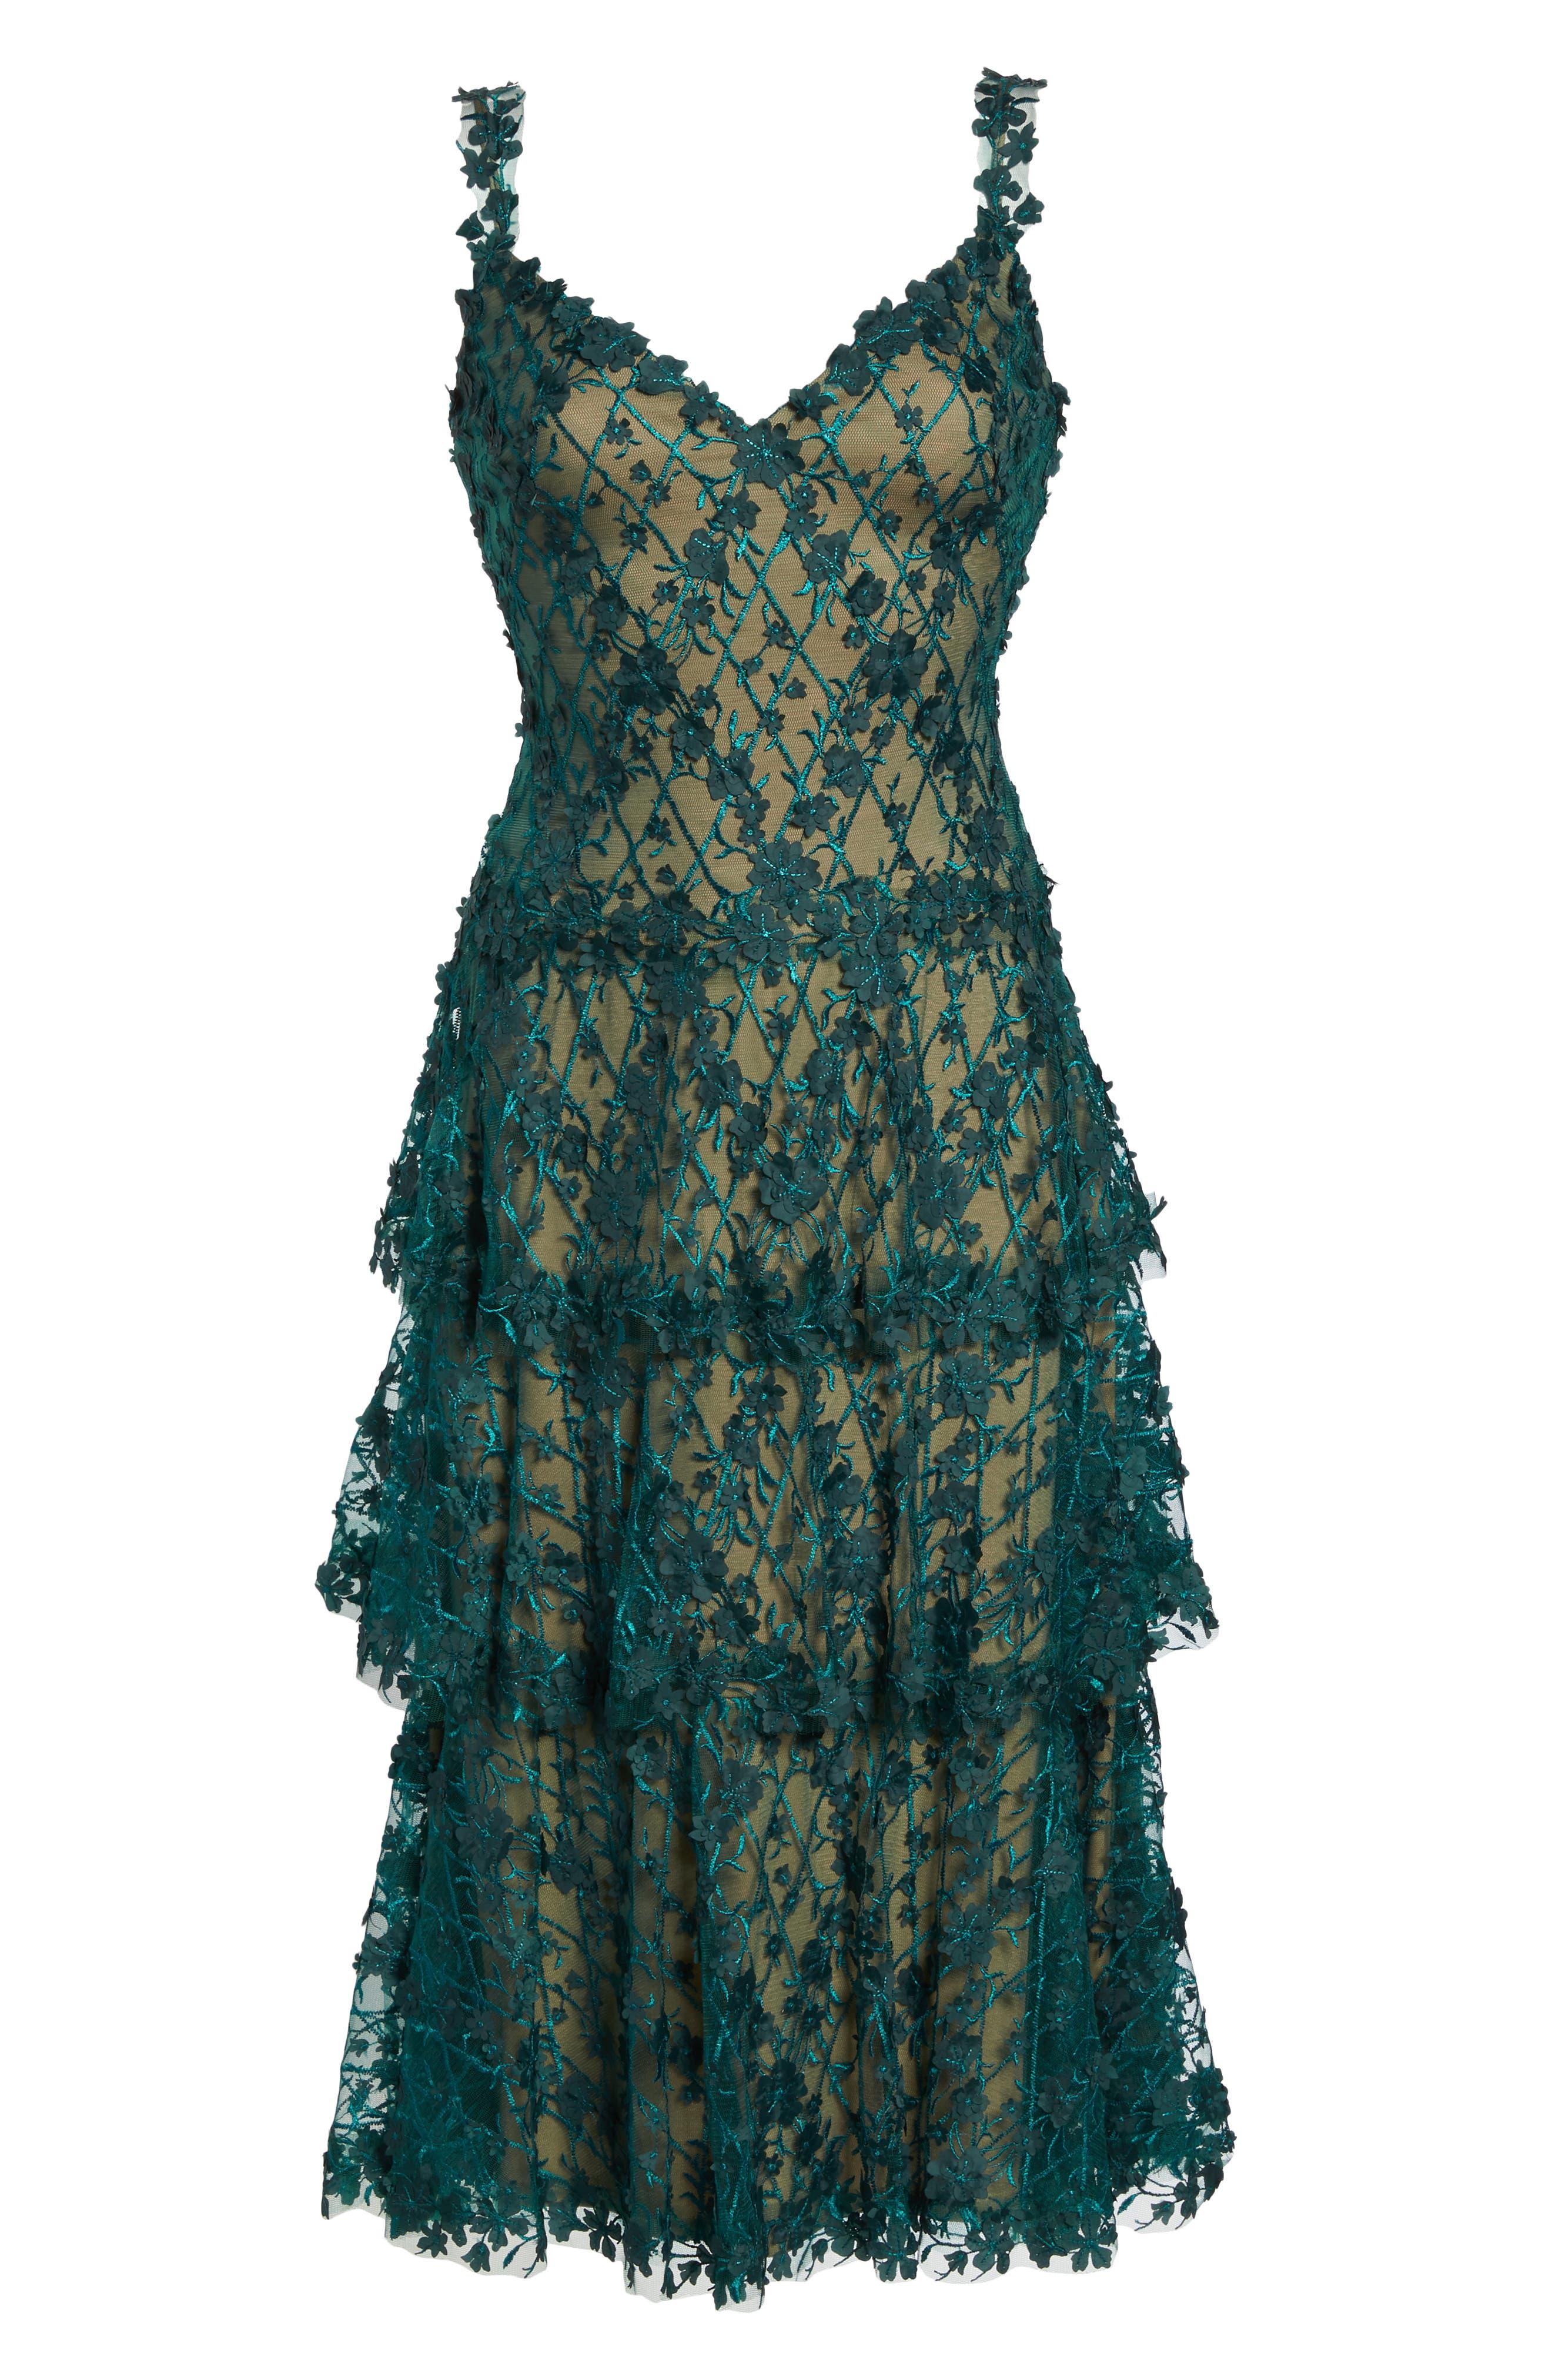 3D Floral Midi Dress,                             Alternate thumbnail 6, color,                             PINE/ NUDE